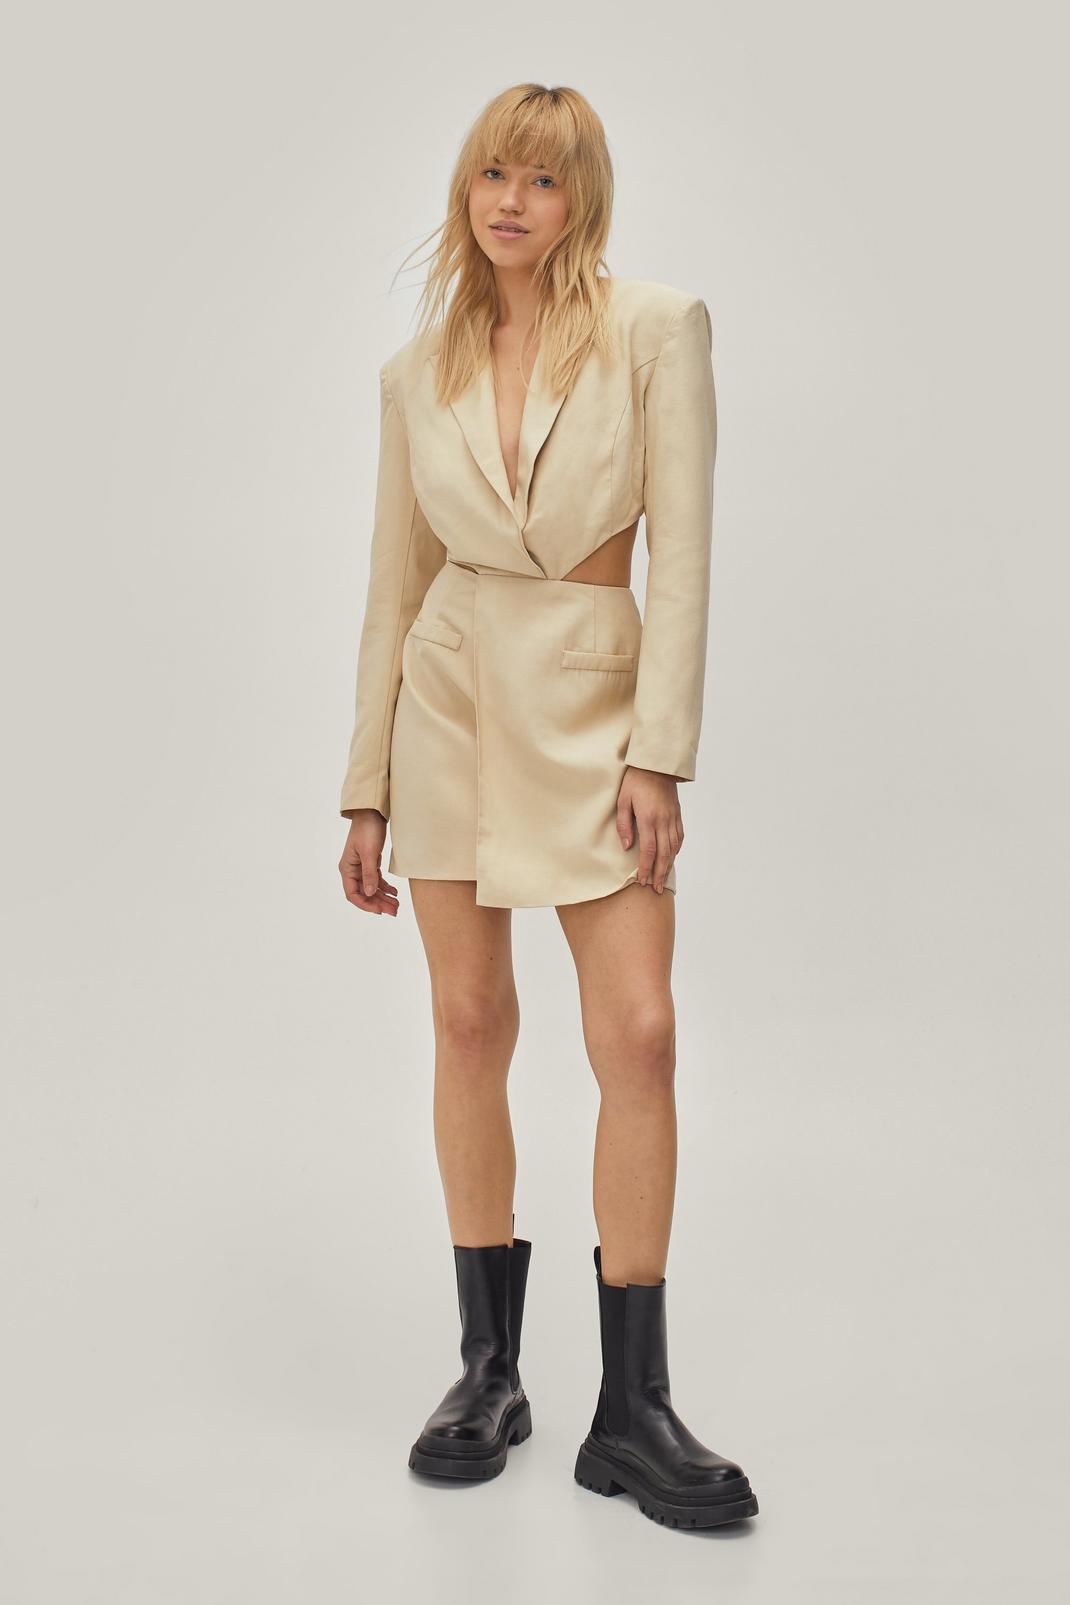 Twisted Cut Out Mini Blazer Dress   NastyGal